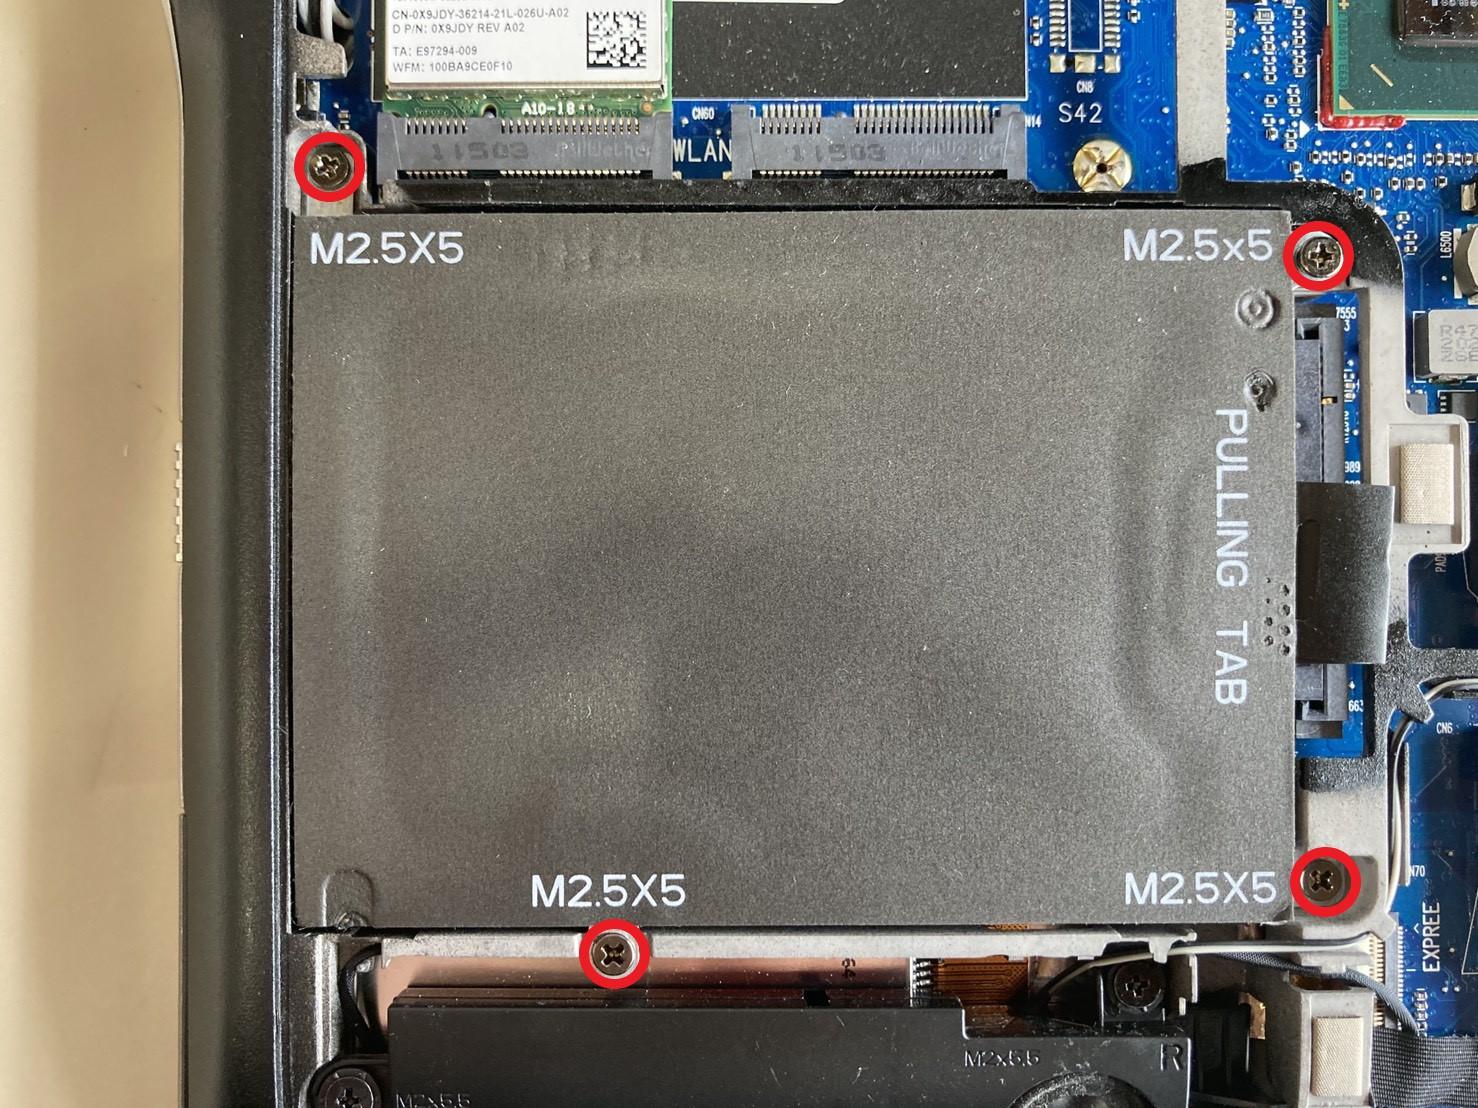 Dell Latitude E6220をSSD換装する手順を徹底解説【分解方法】